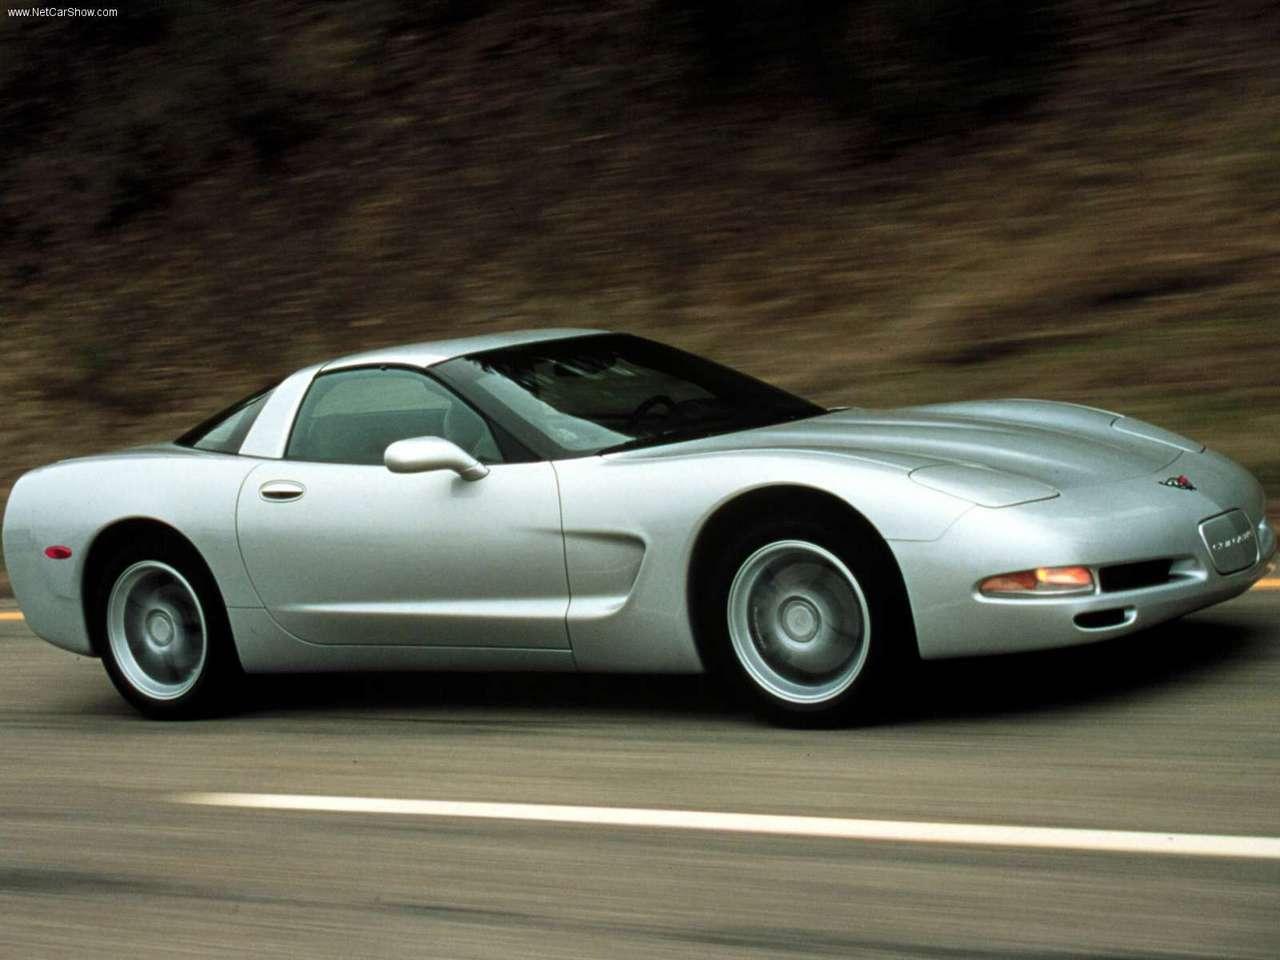 2000 Chevrolet Corvette 1280x960